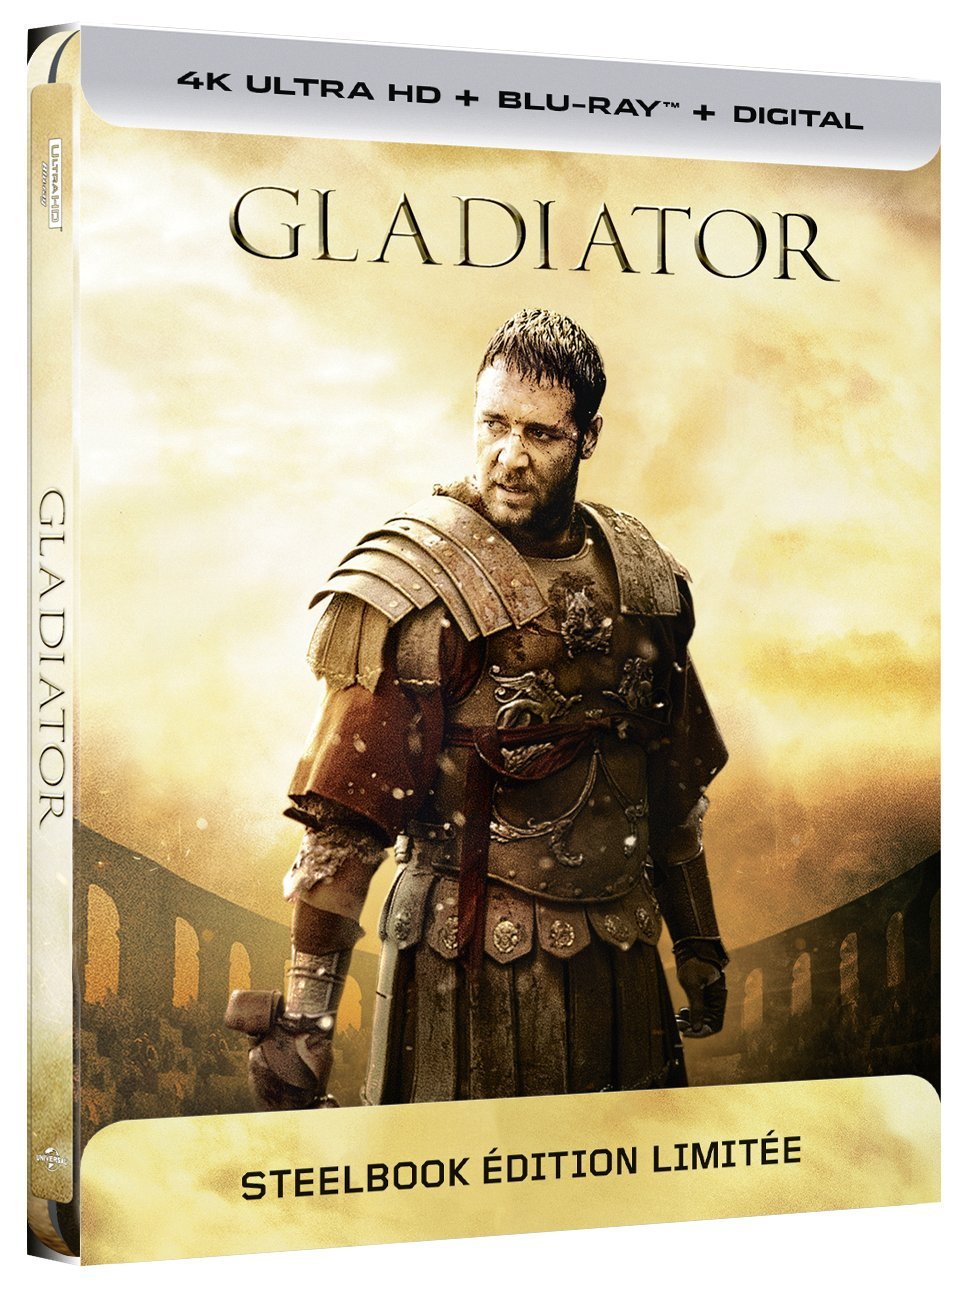 Amazon.com: Gladiator [4K Ultra HD + Blu-Ray Limited Edition Steelbook]:  Movies & TV